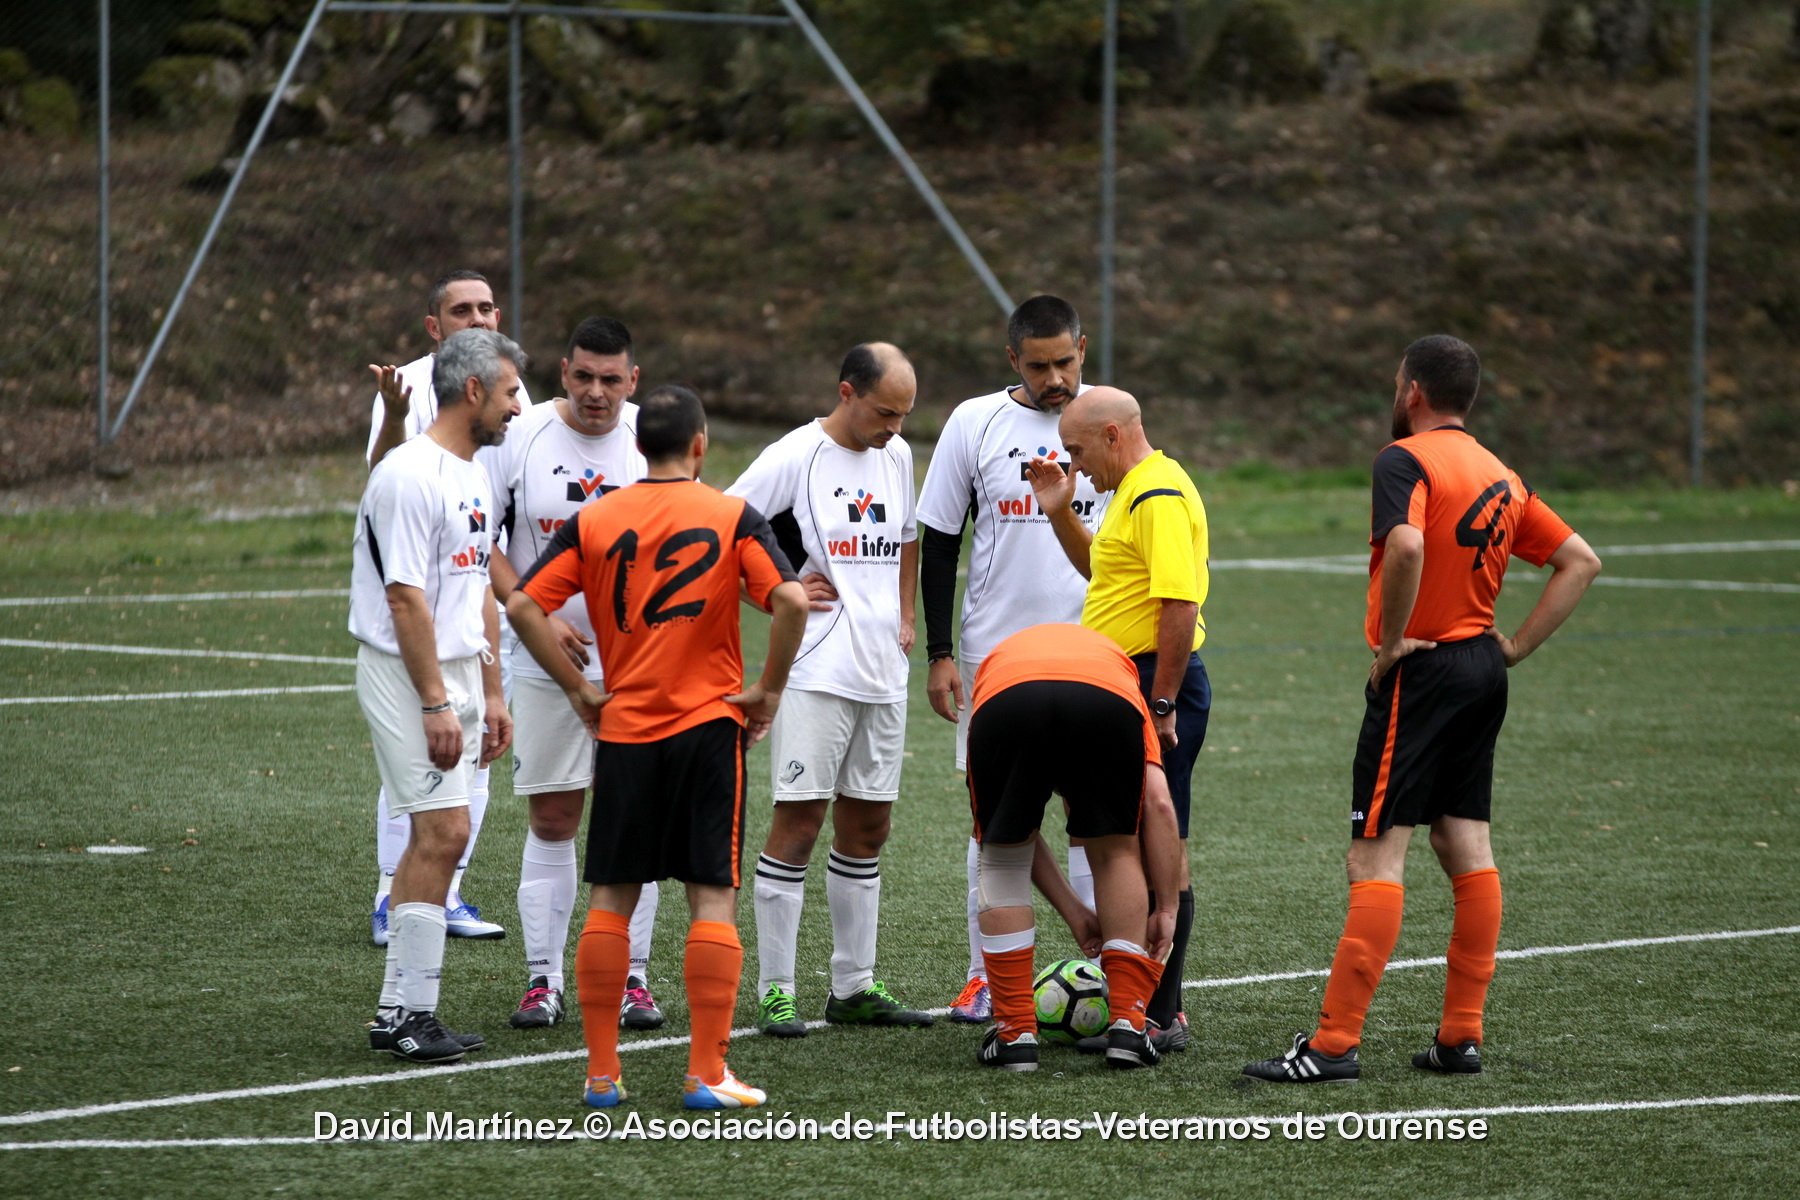 Futbol_Veteranos_Foto_DavidMartinez_03